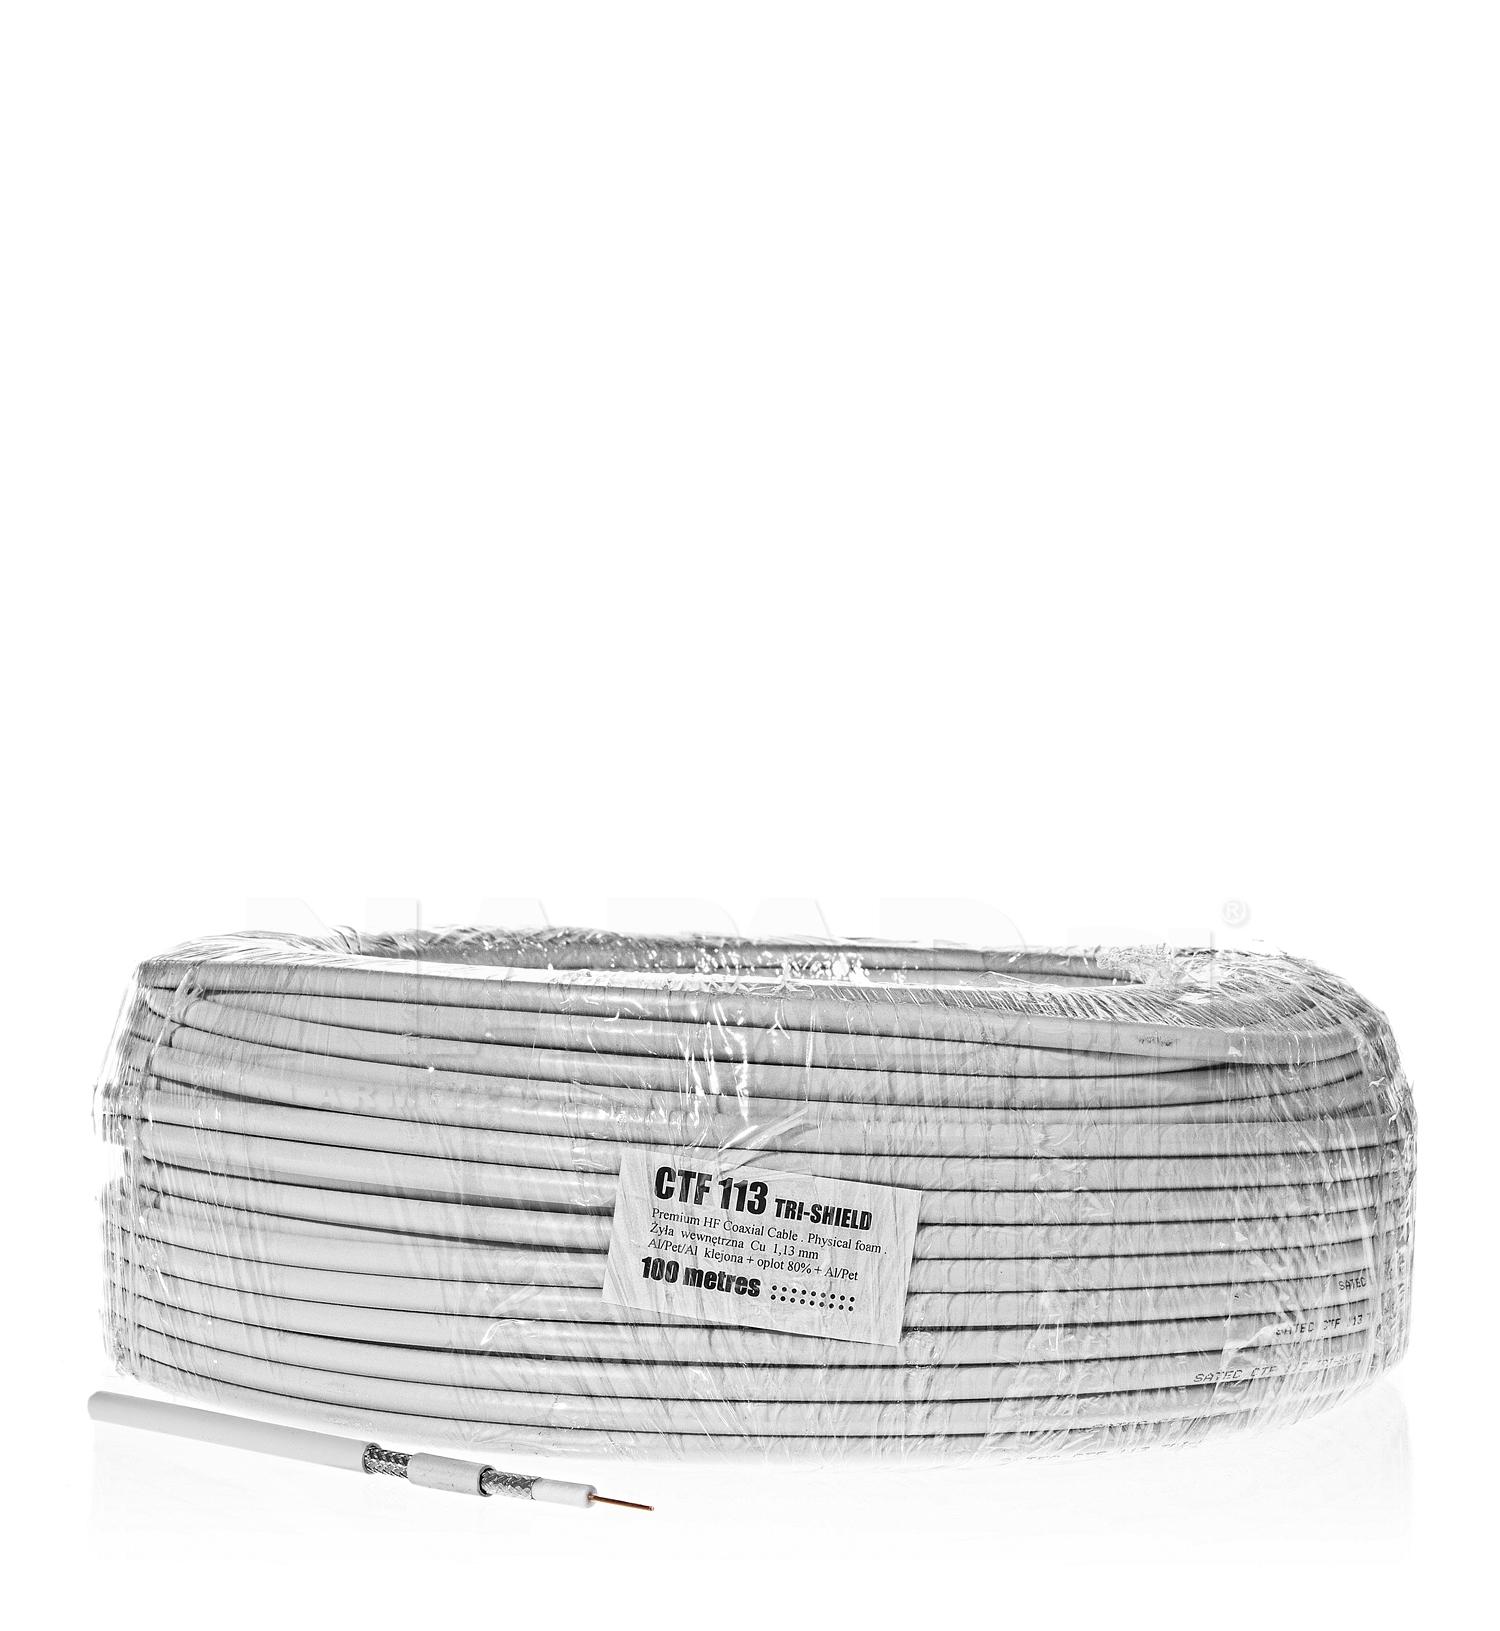 Kabel koncentryczny CTF-113 Tri-shield